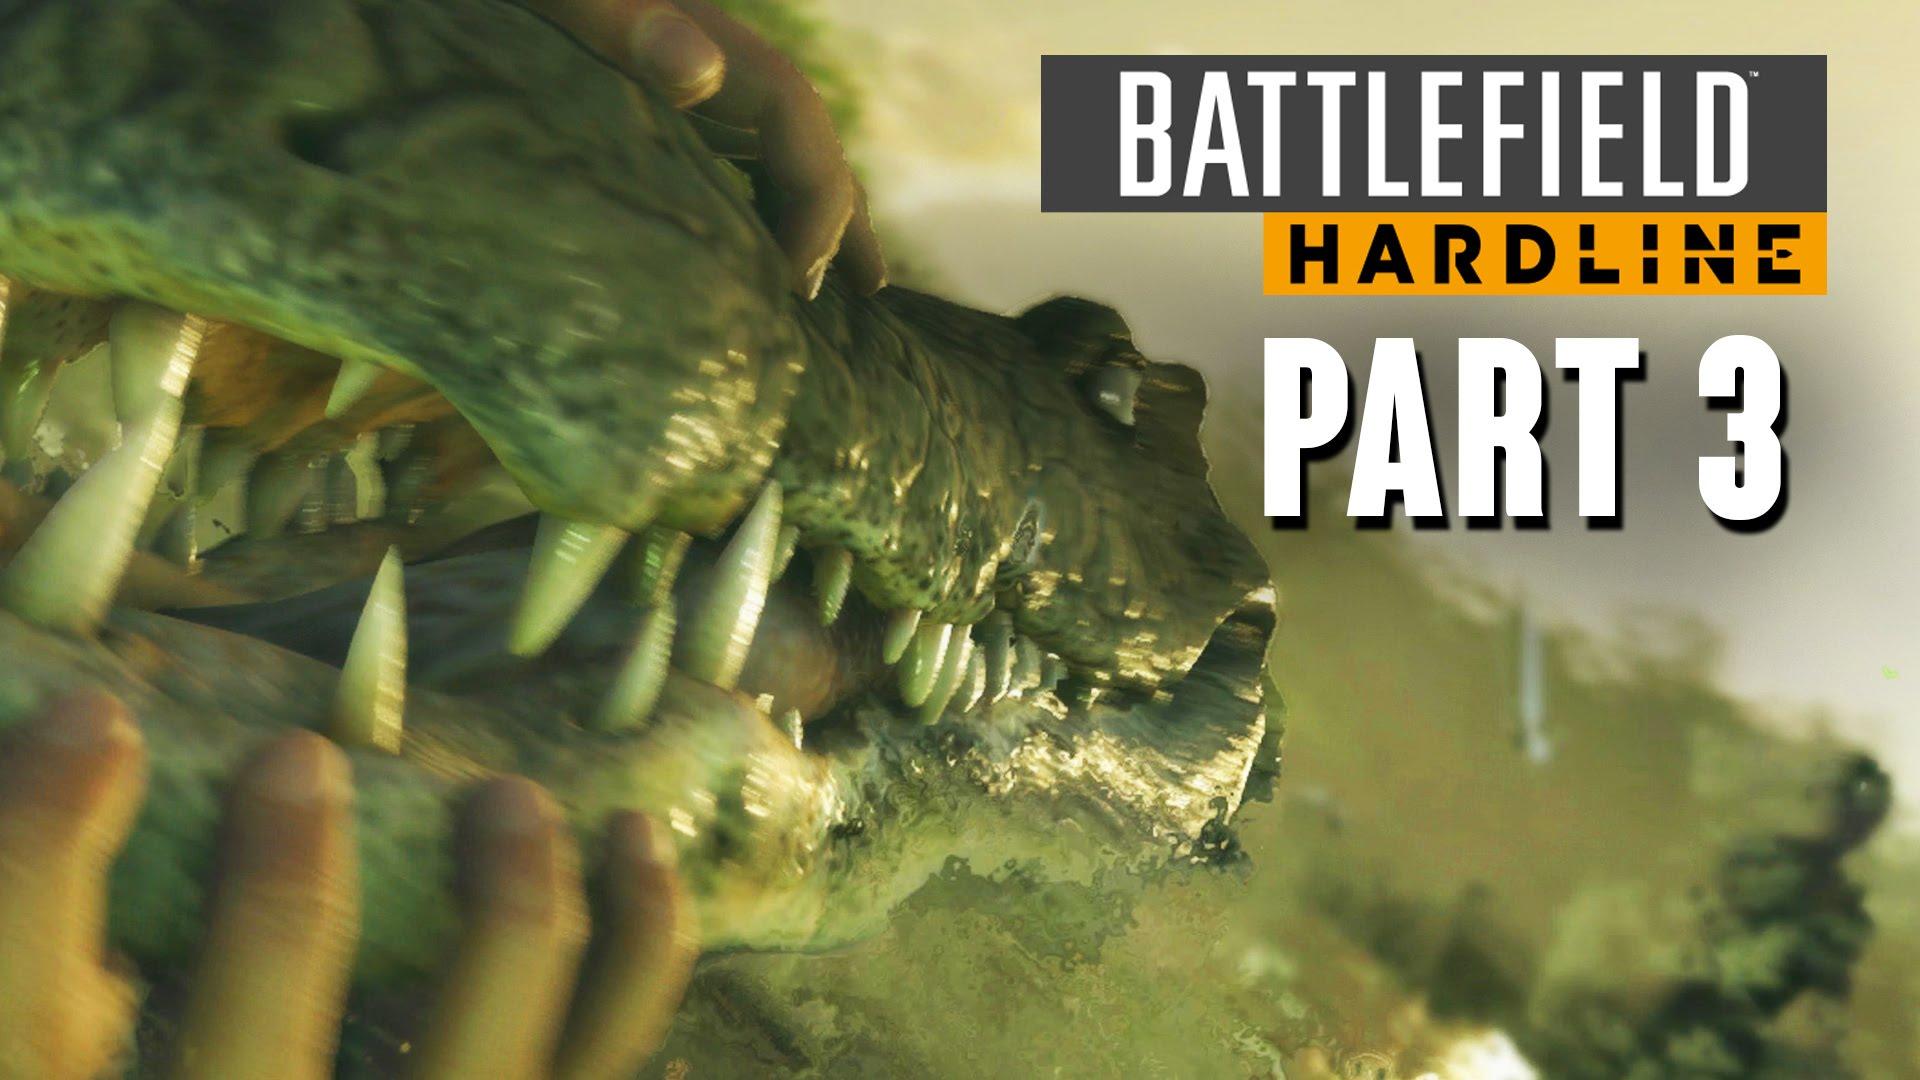 بتلفیلد هاردلاین مرحله3 - Battlefield Hardline-PC Part3